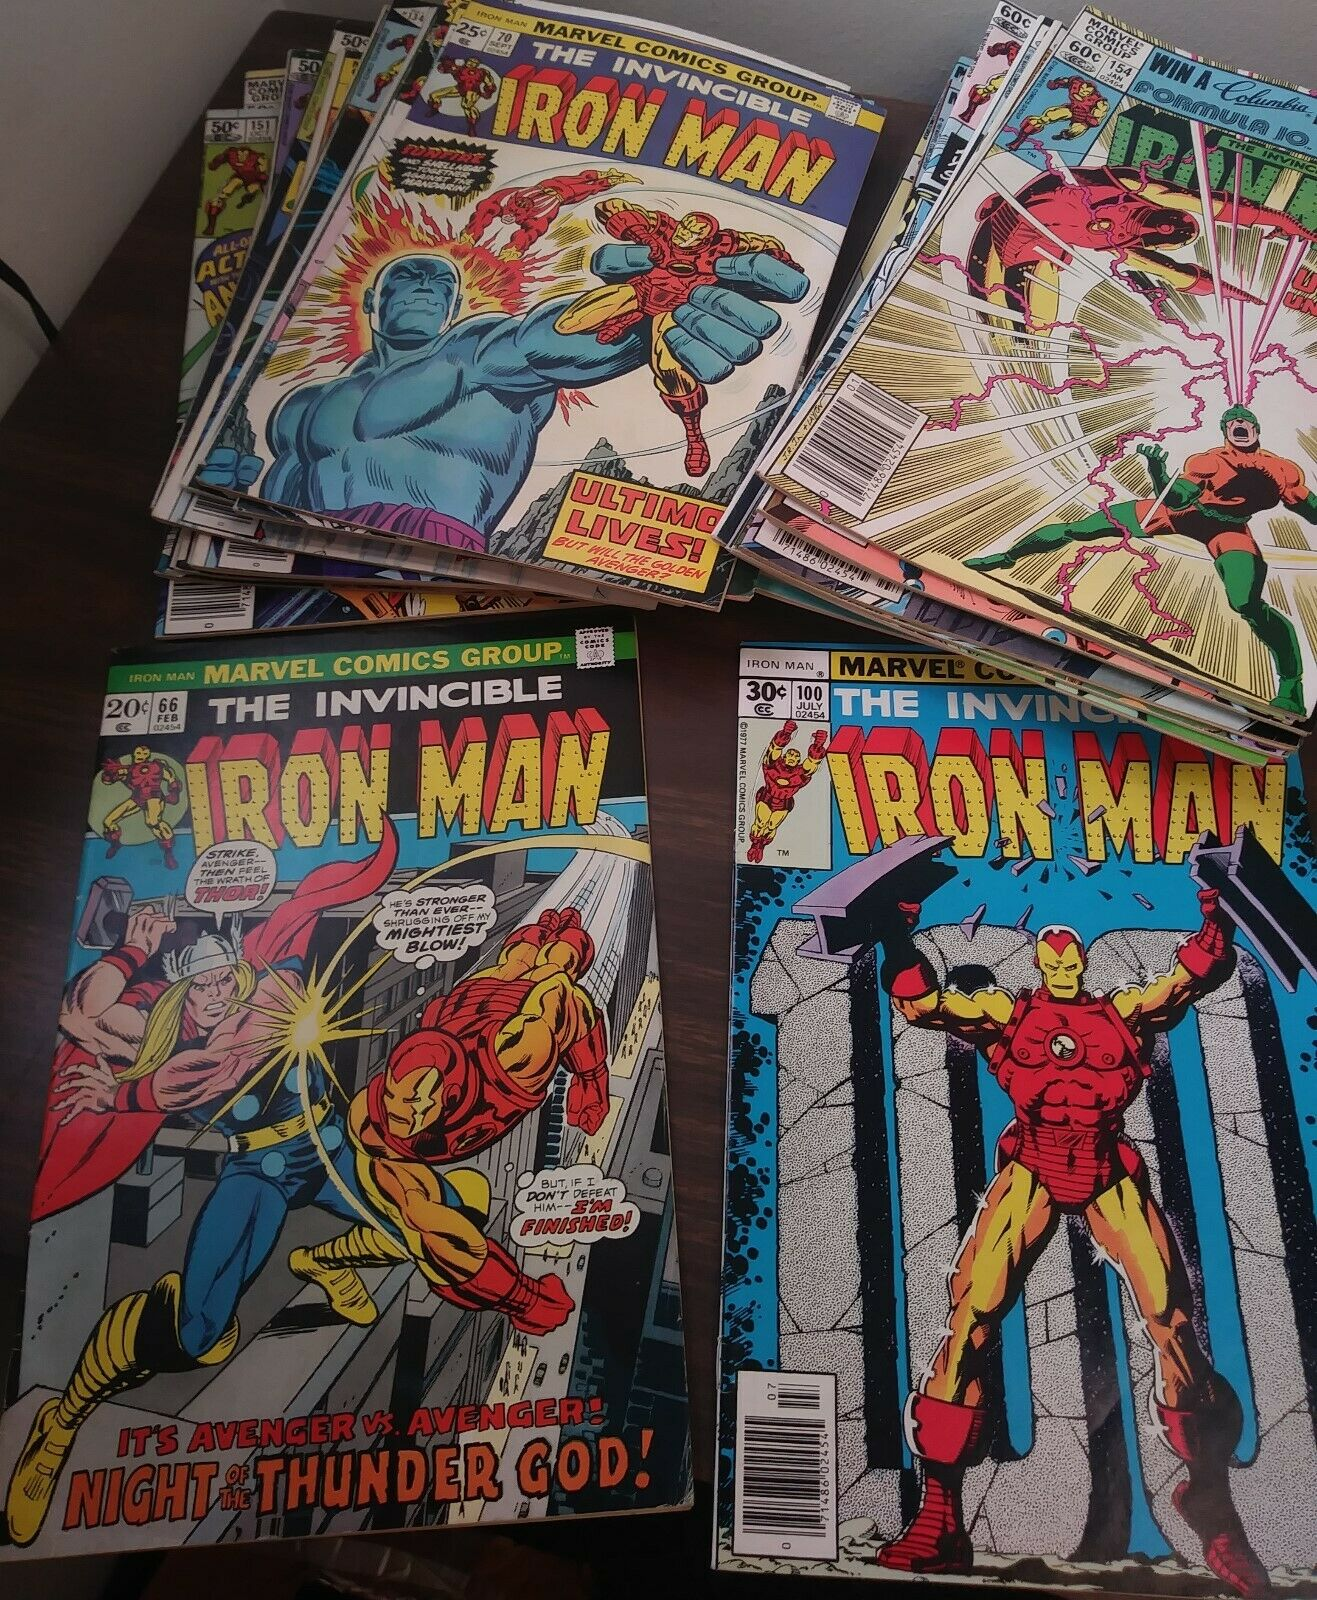 Iron Man Lot-66,70,84,87,93,95,100,120,125,134-136,138,141,144,146-148,200,more